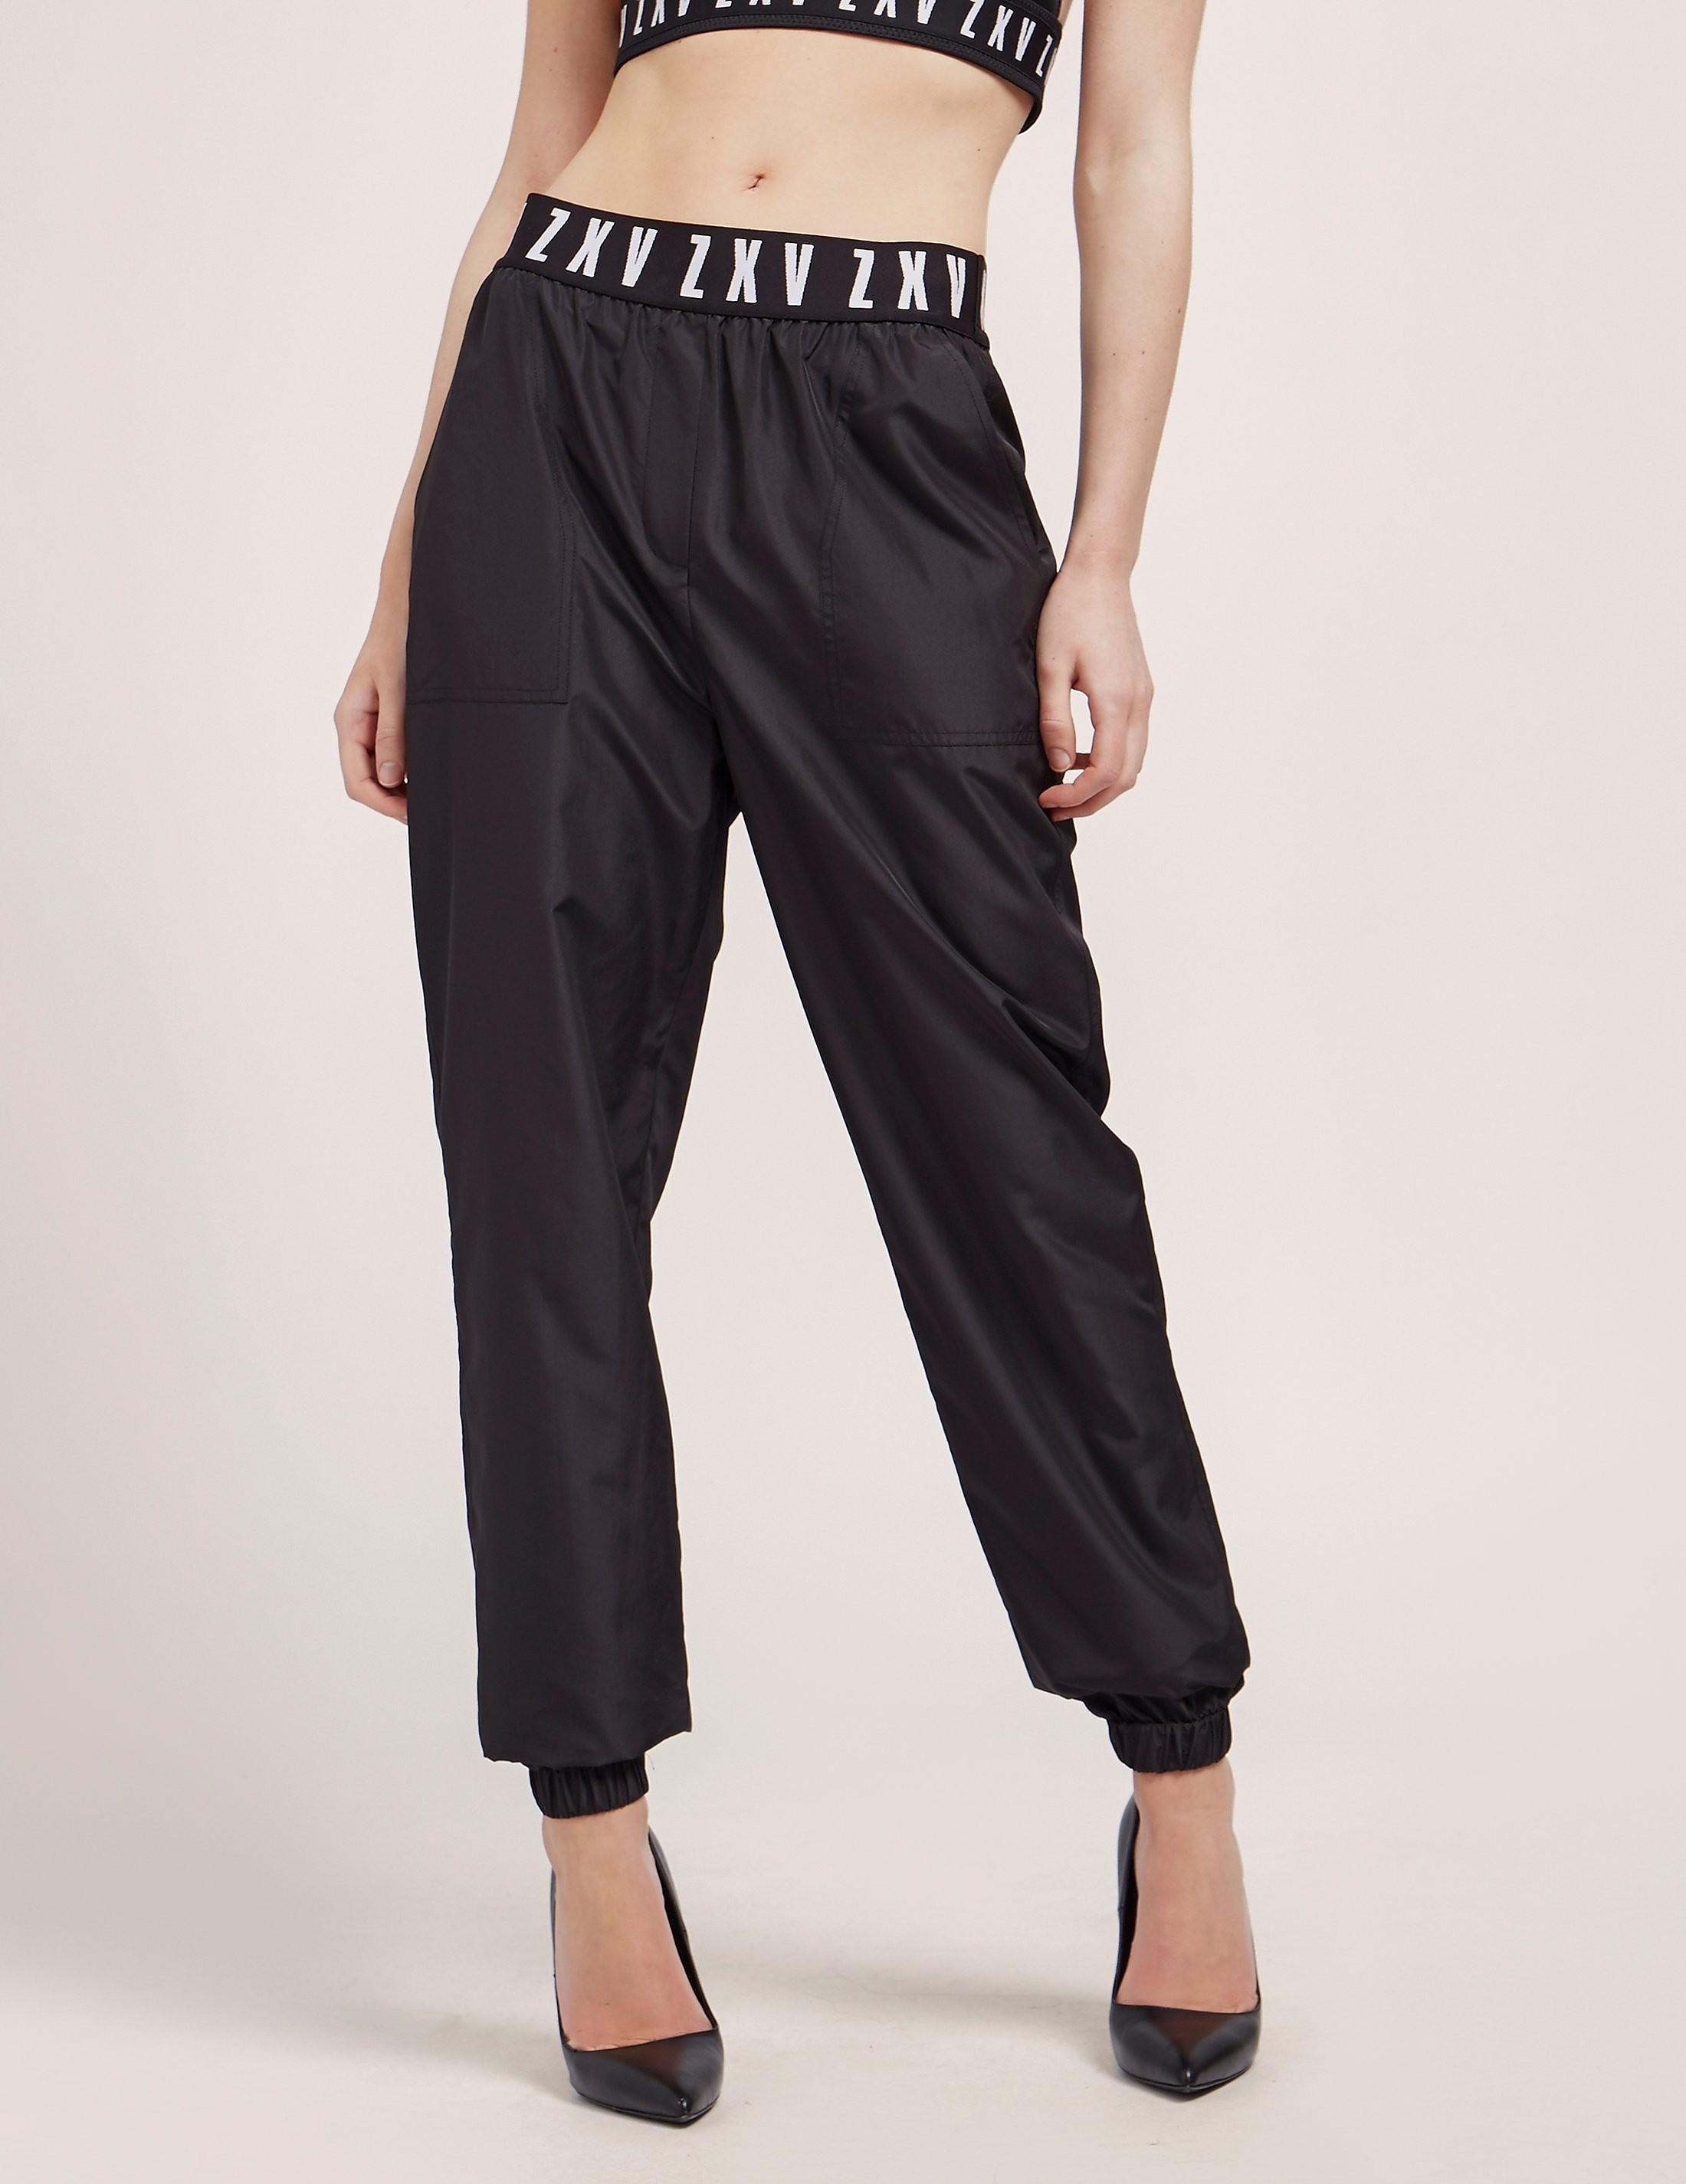 Versus Versace X Zayn Nylon Track Pants